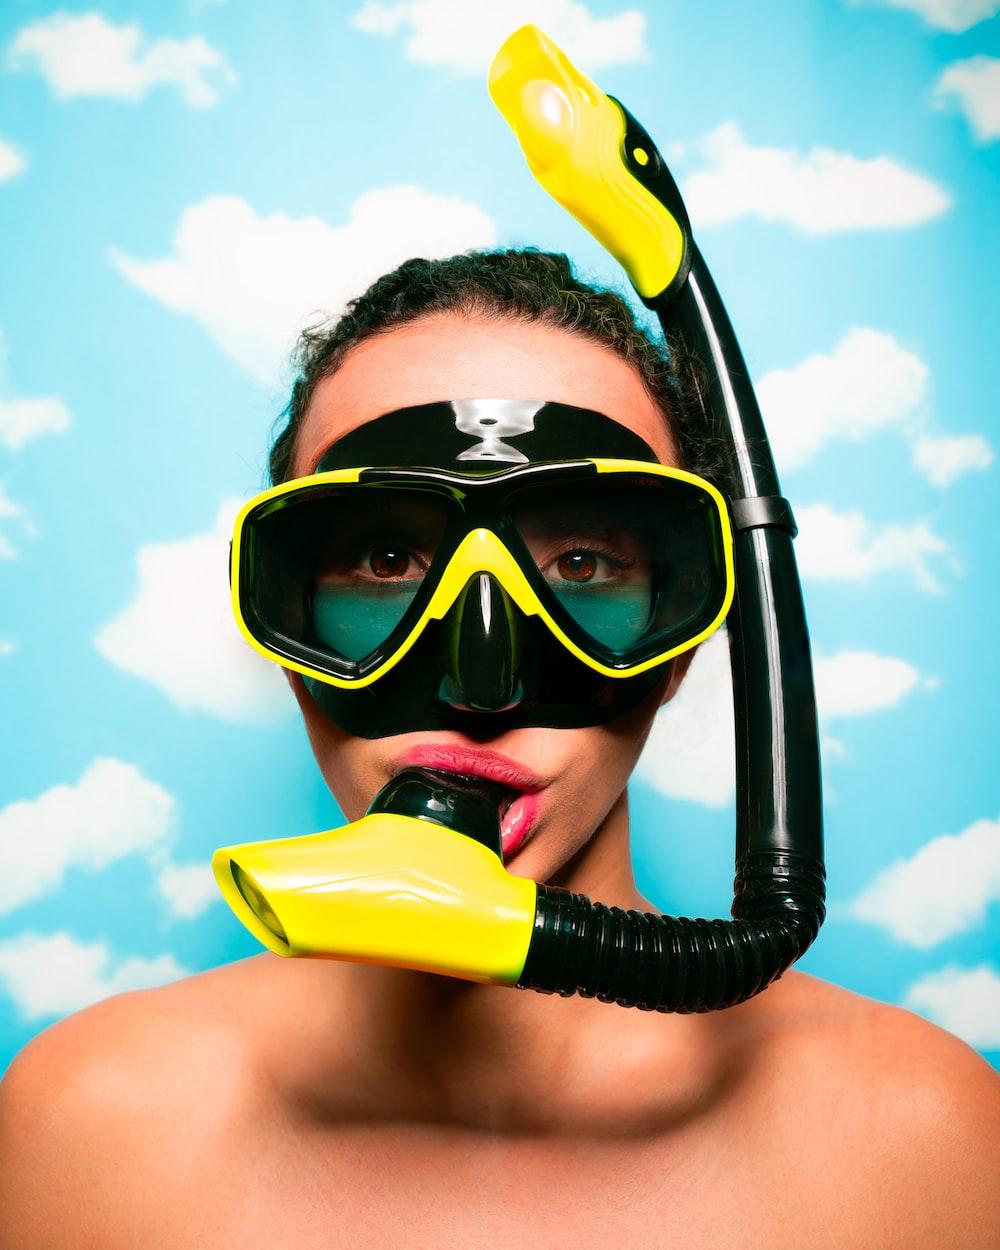 woman wearing black and white scuba gear